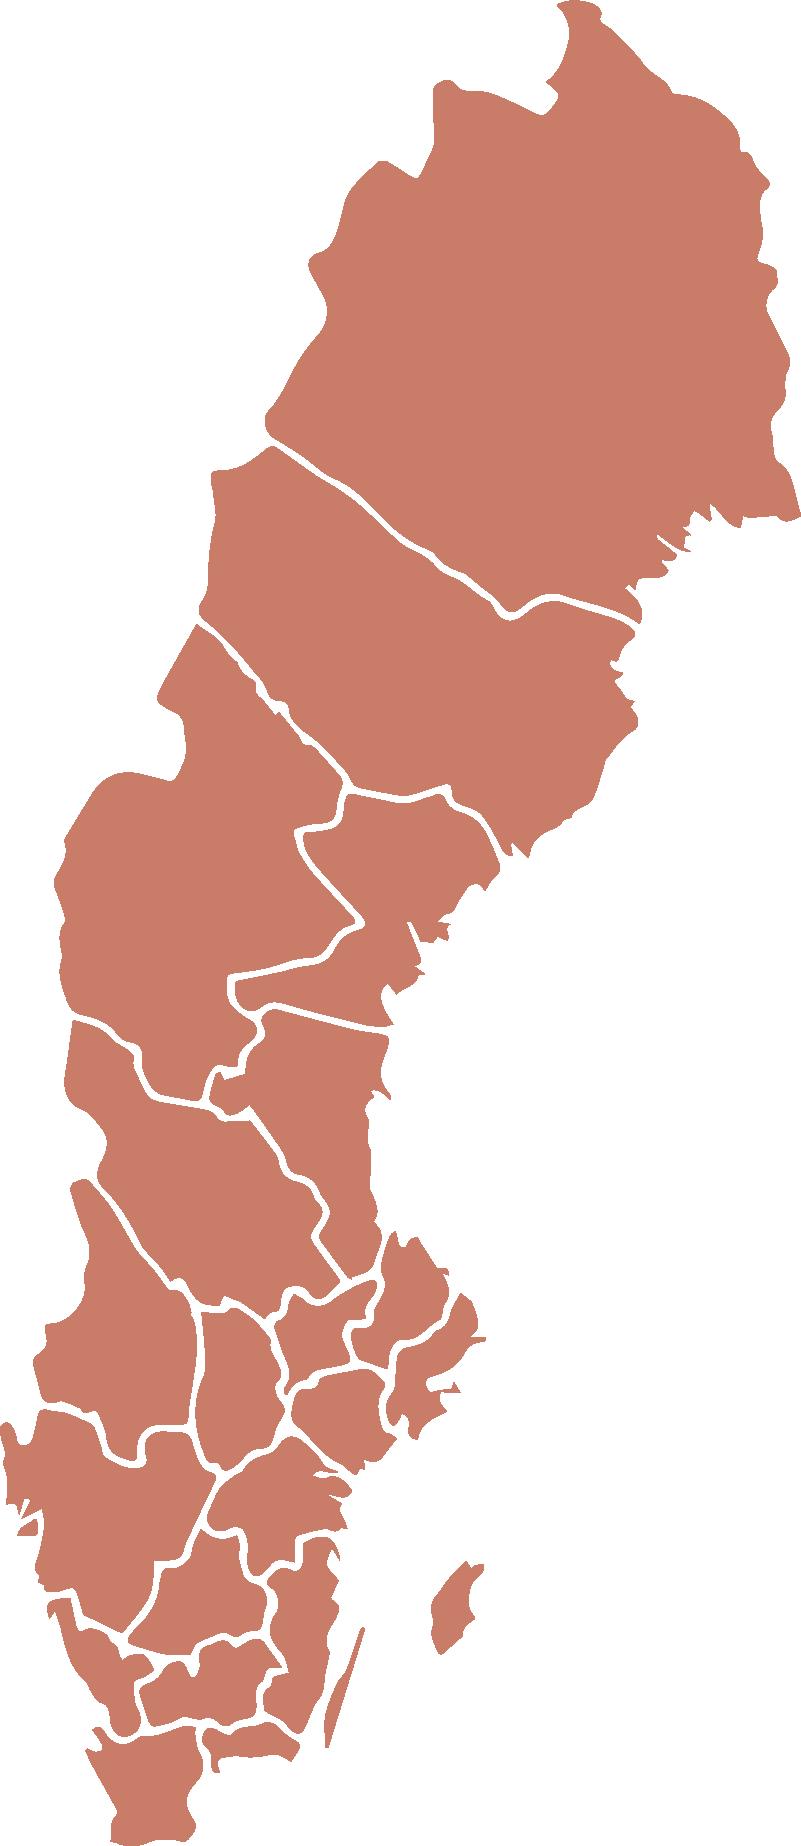 Bild av Sverigekarta